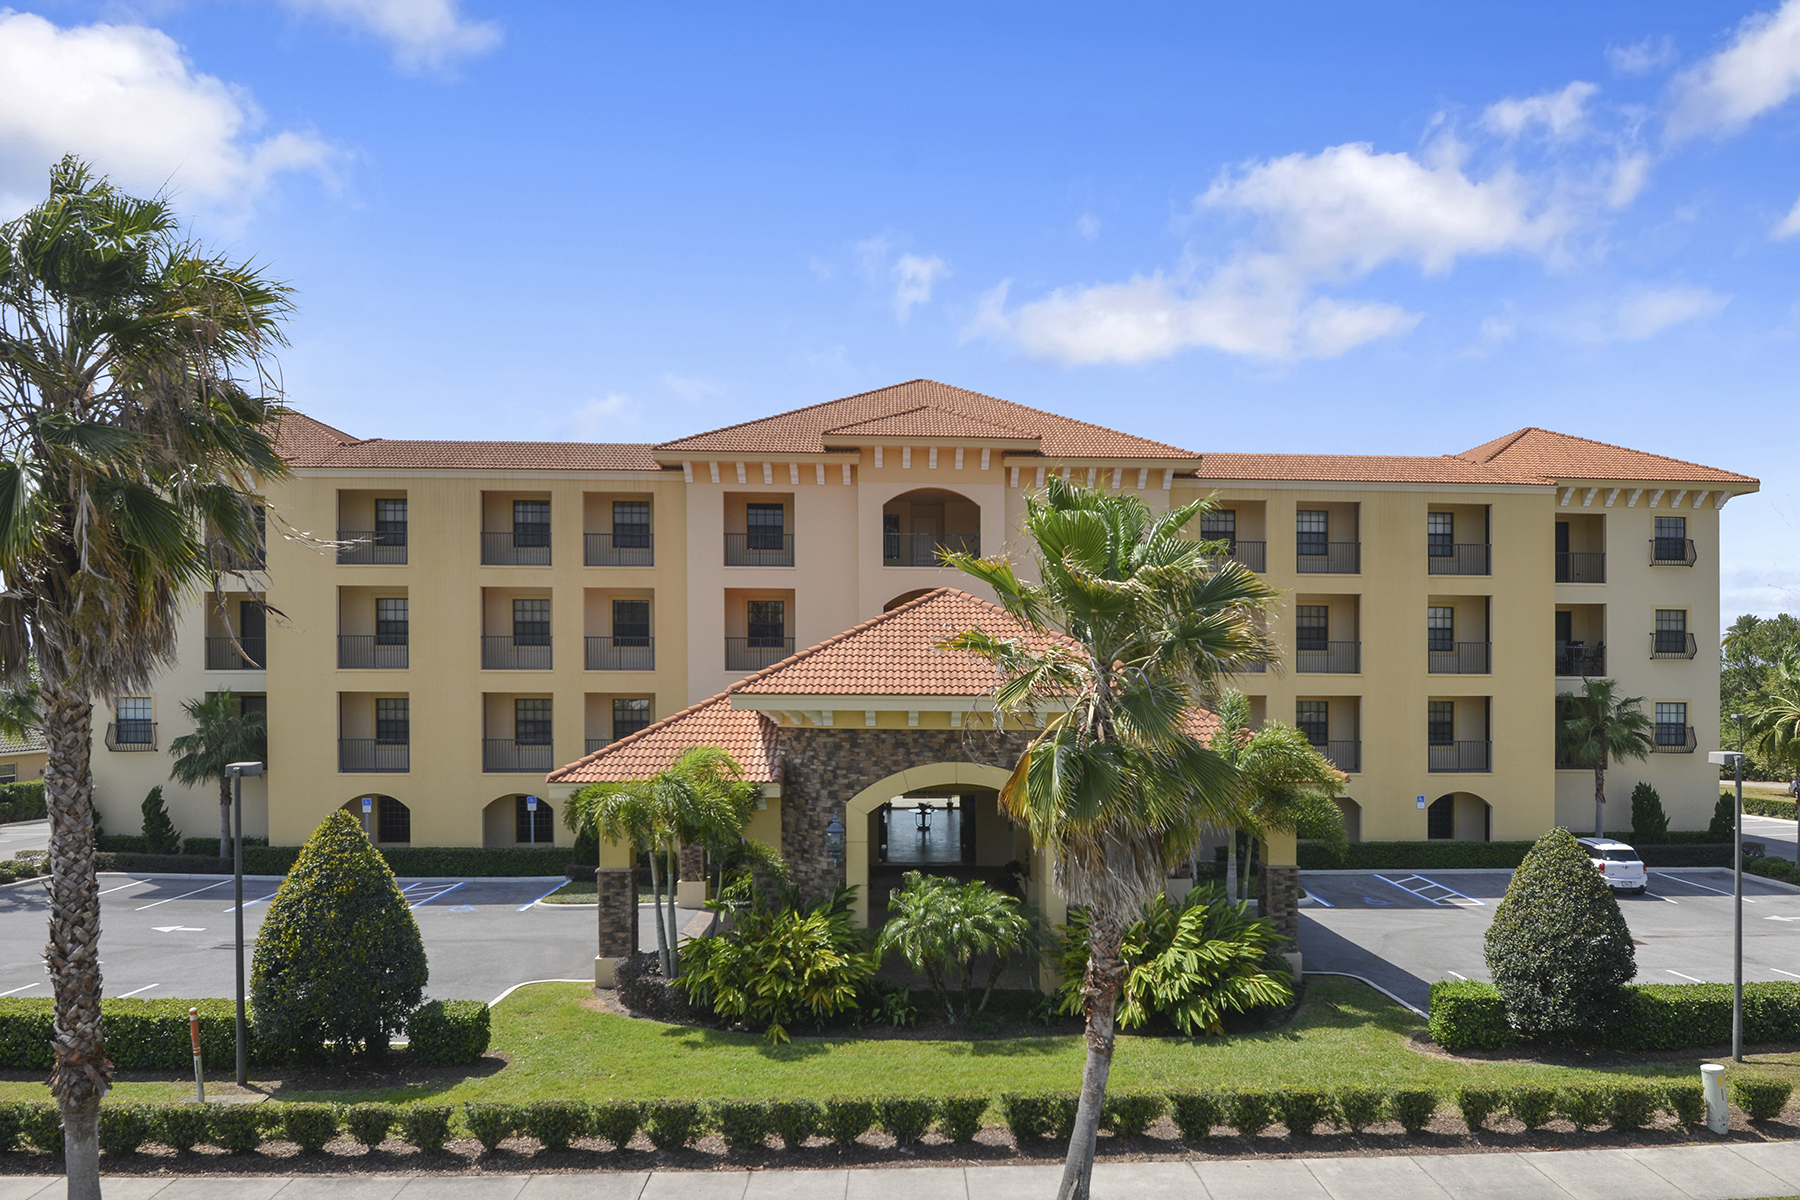 Condominium for Sale at SEBRING - FLORIDA 2351 Lakeview Dr 411 Sebring, Florida, 33870 United States